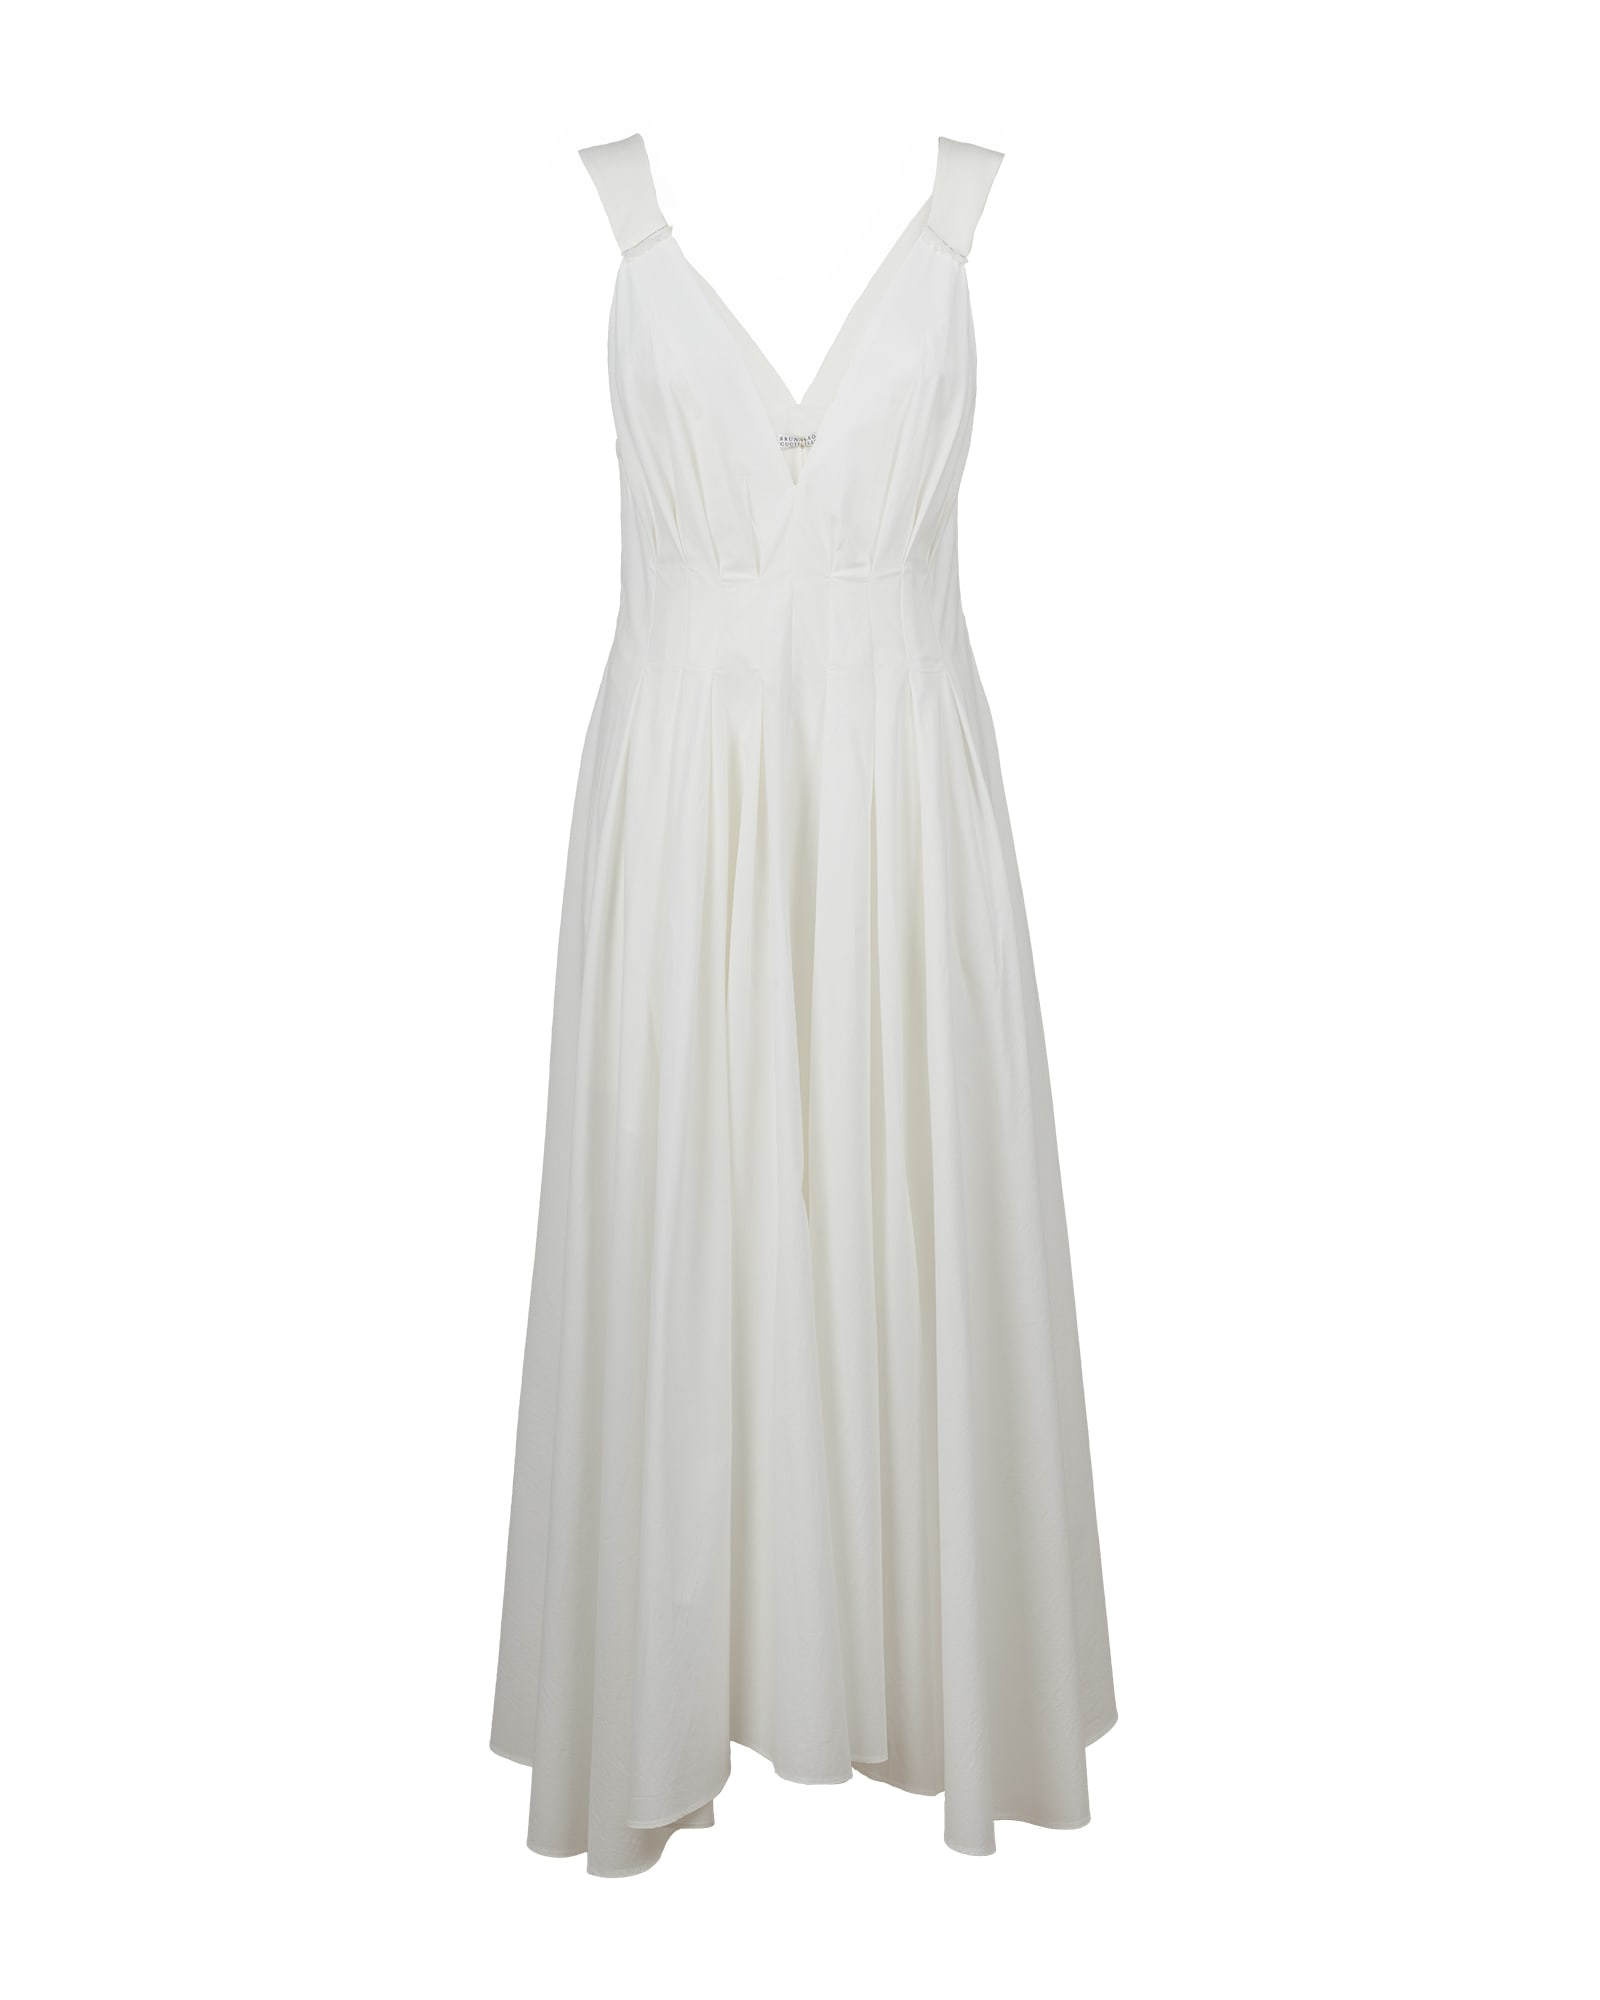 Brunello Cucinelli cotton poplin dress